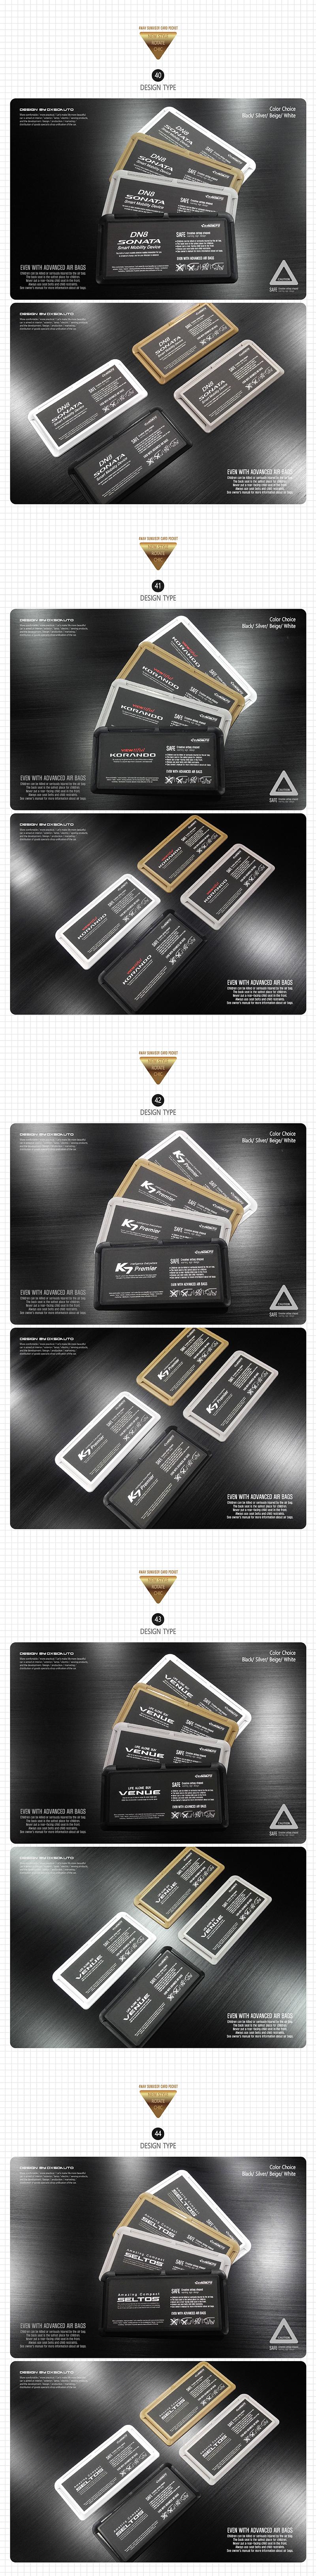 [DXSOAUTO] 커스터마이징 4WAY 썬바이저 카드포켓 (1EA / 1SET) 베뉴